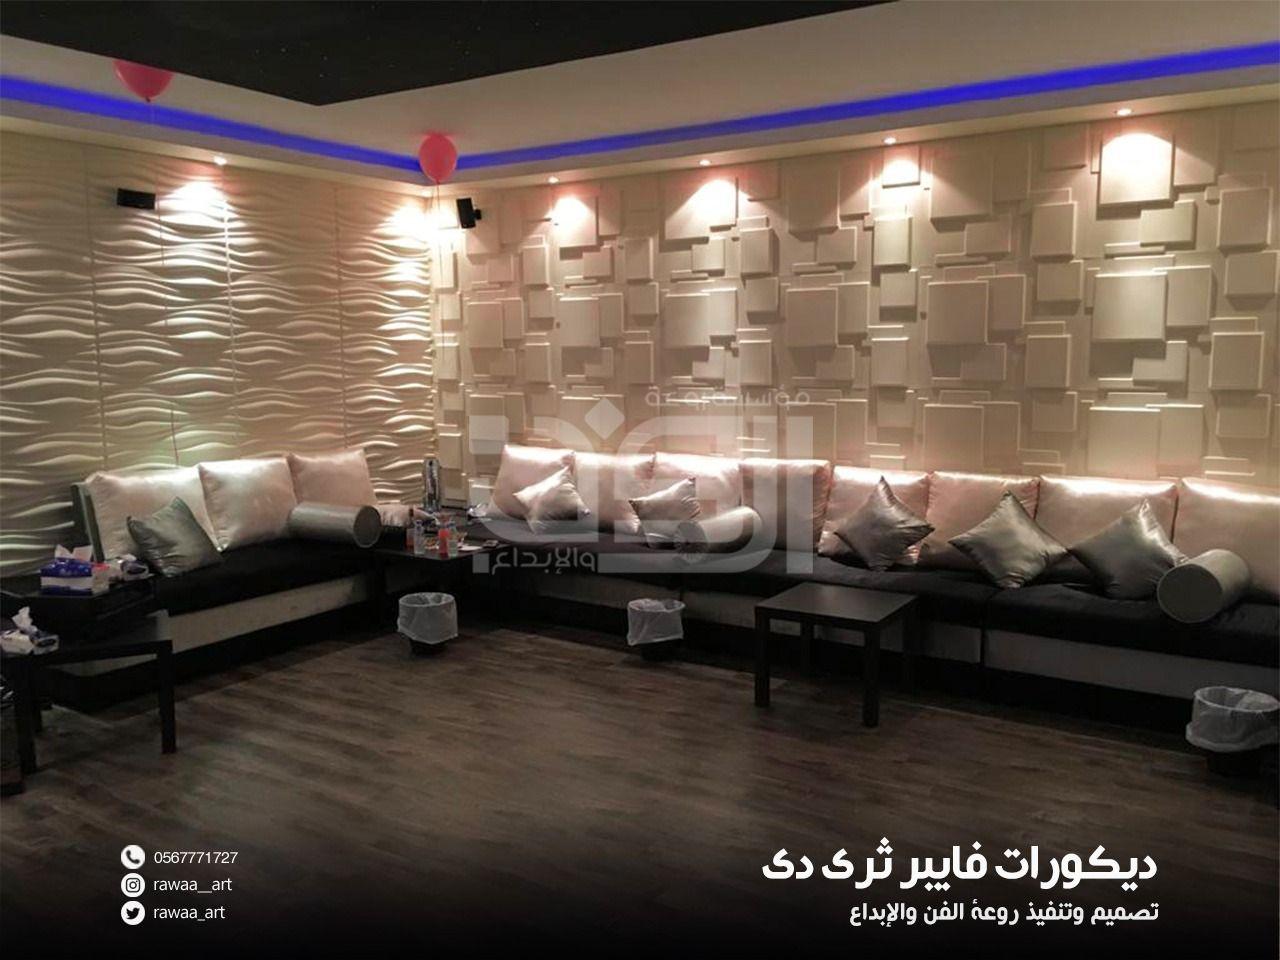 تركيب ألواح فايبر 0567771727 Ceiling Lights Home Decor Decor